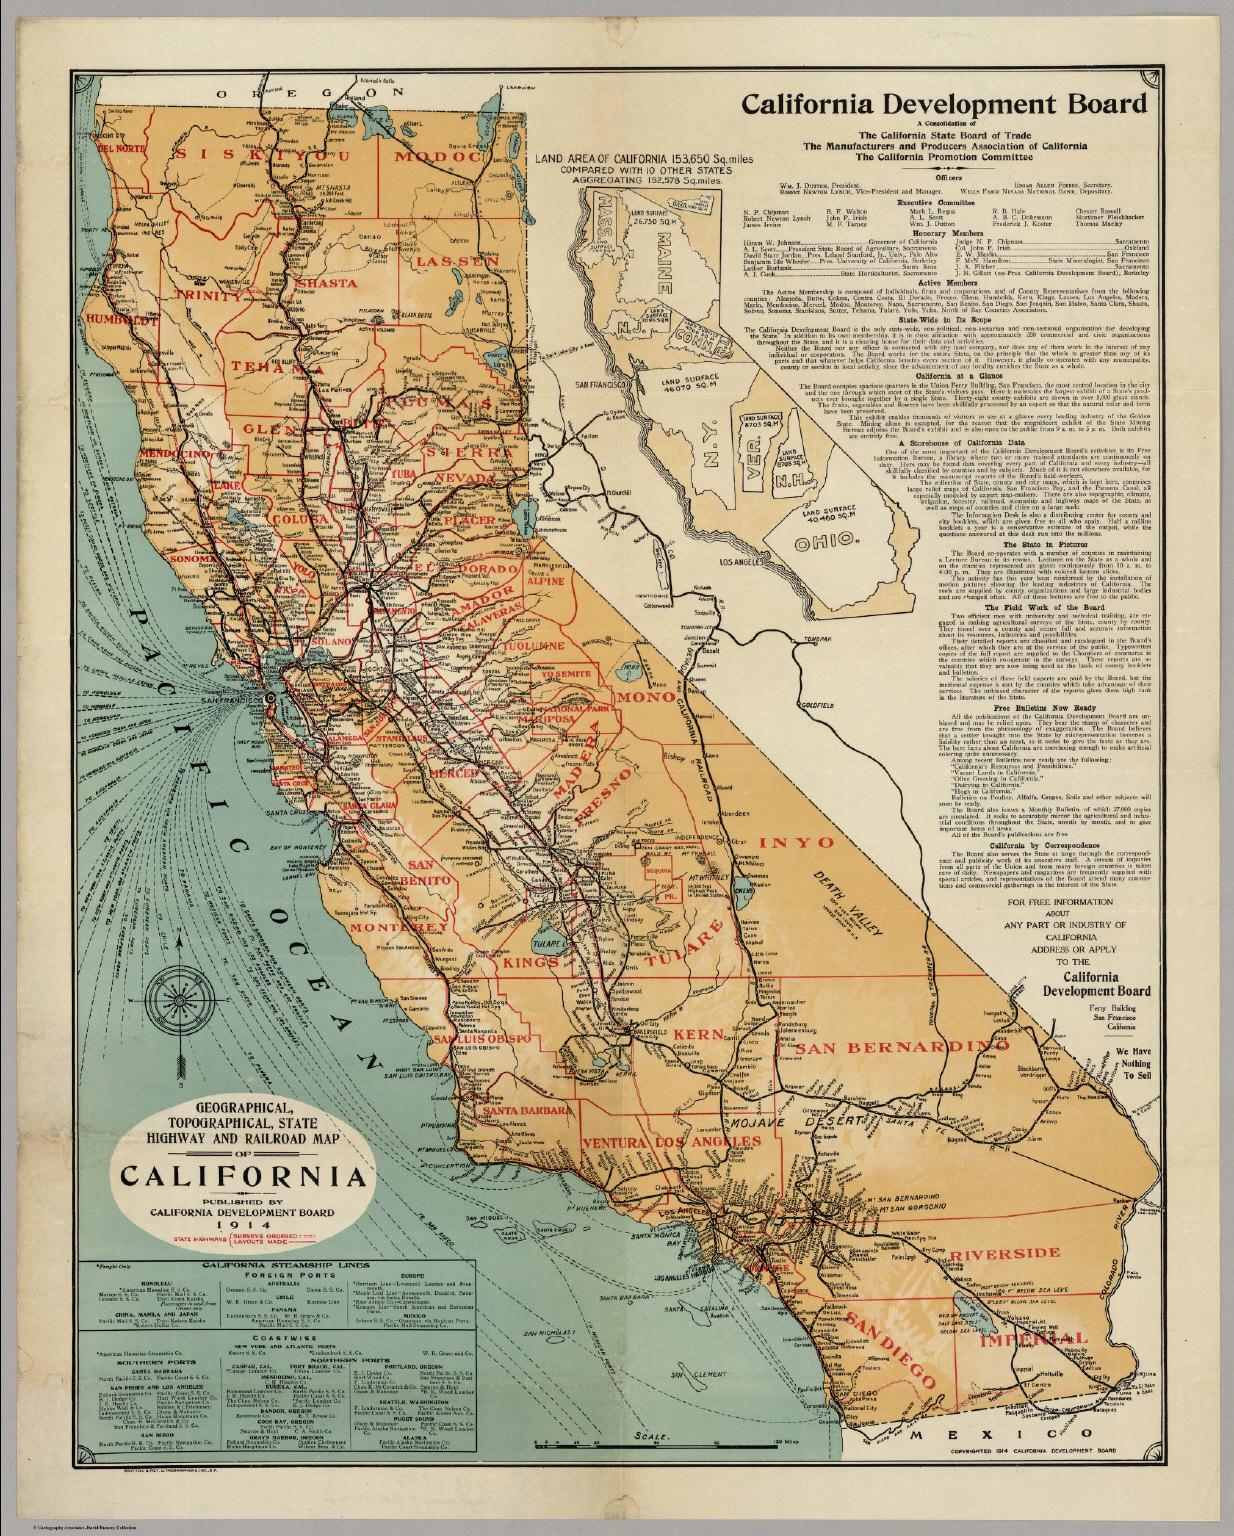 California Highway And Railroad Map - David Rumsey Historical Map - California Railroad Map